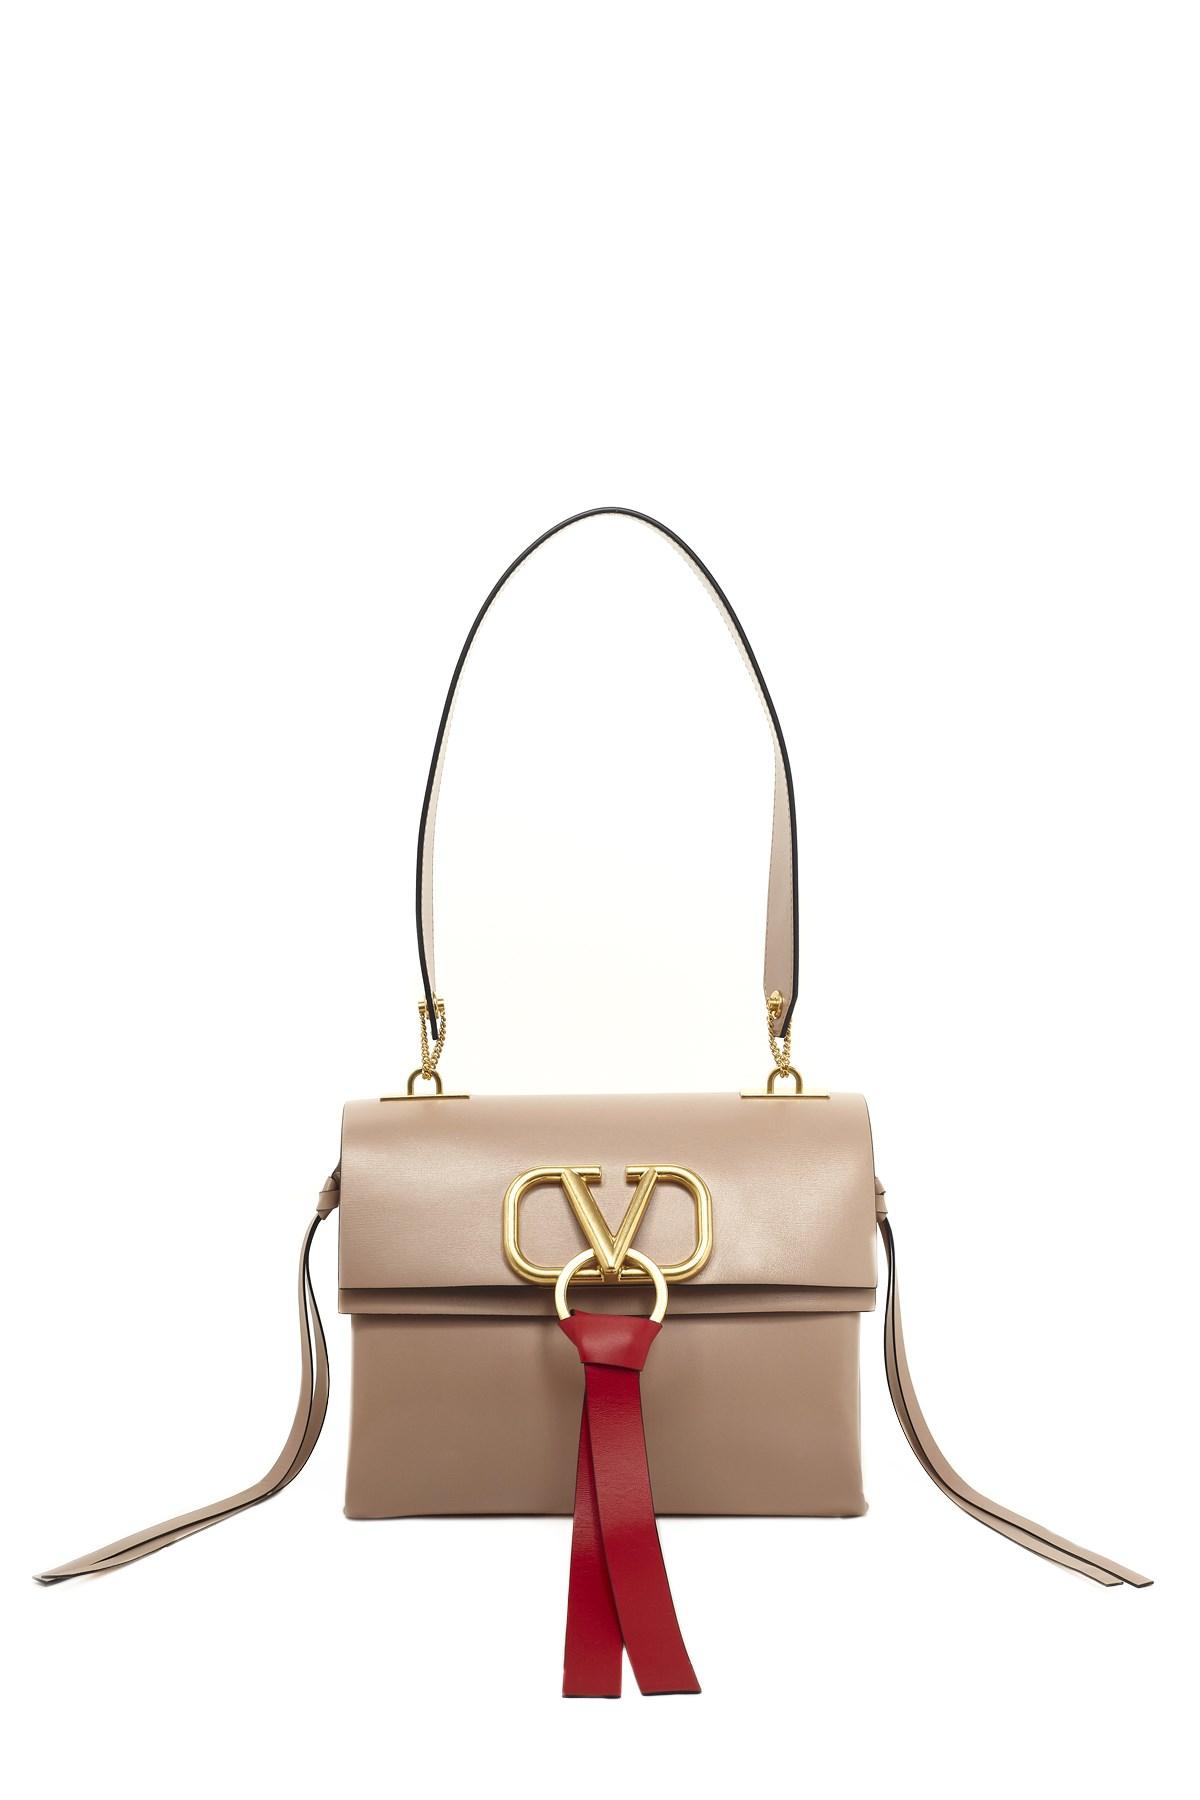 8379eb24e0 valentino garavani  Vee ring  shoulder bag available on julian ...